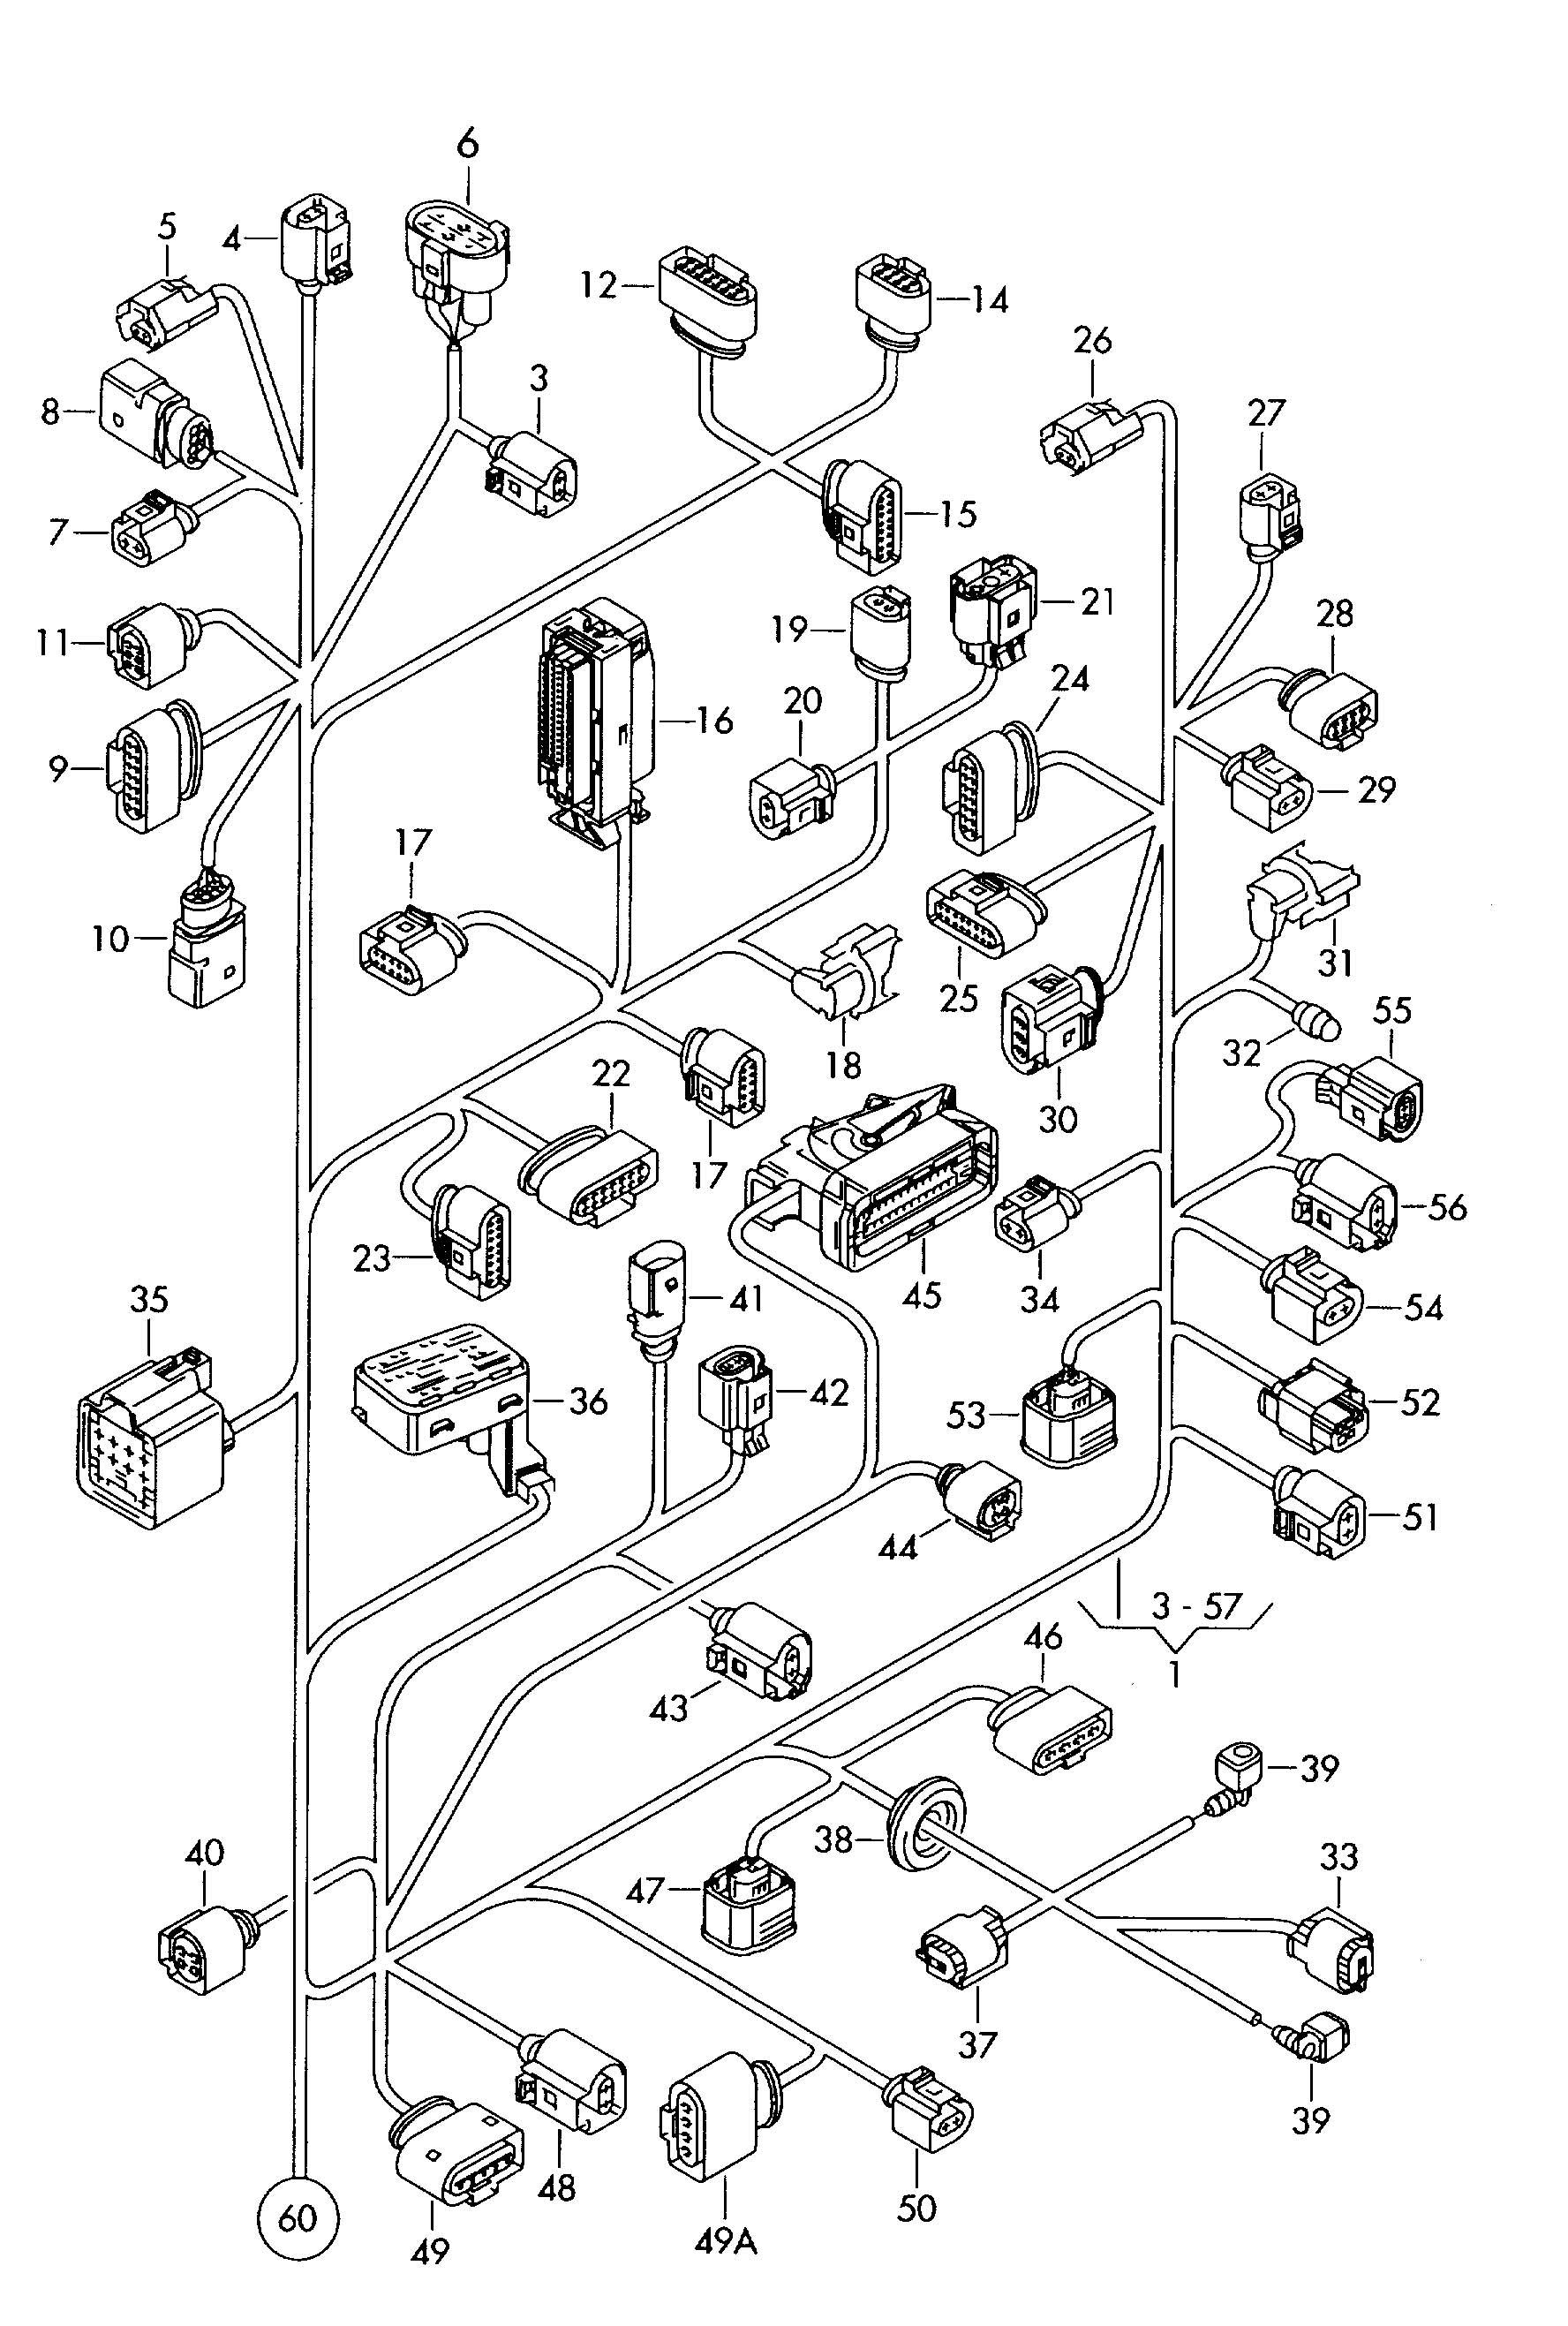 2007 chevy suburban parts diagram dish tv antenna wiring chevrolet 5500 get free image